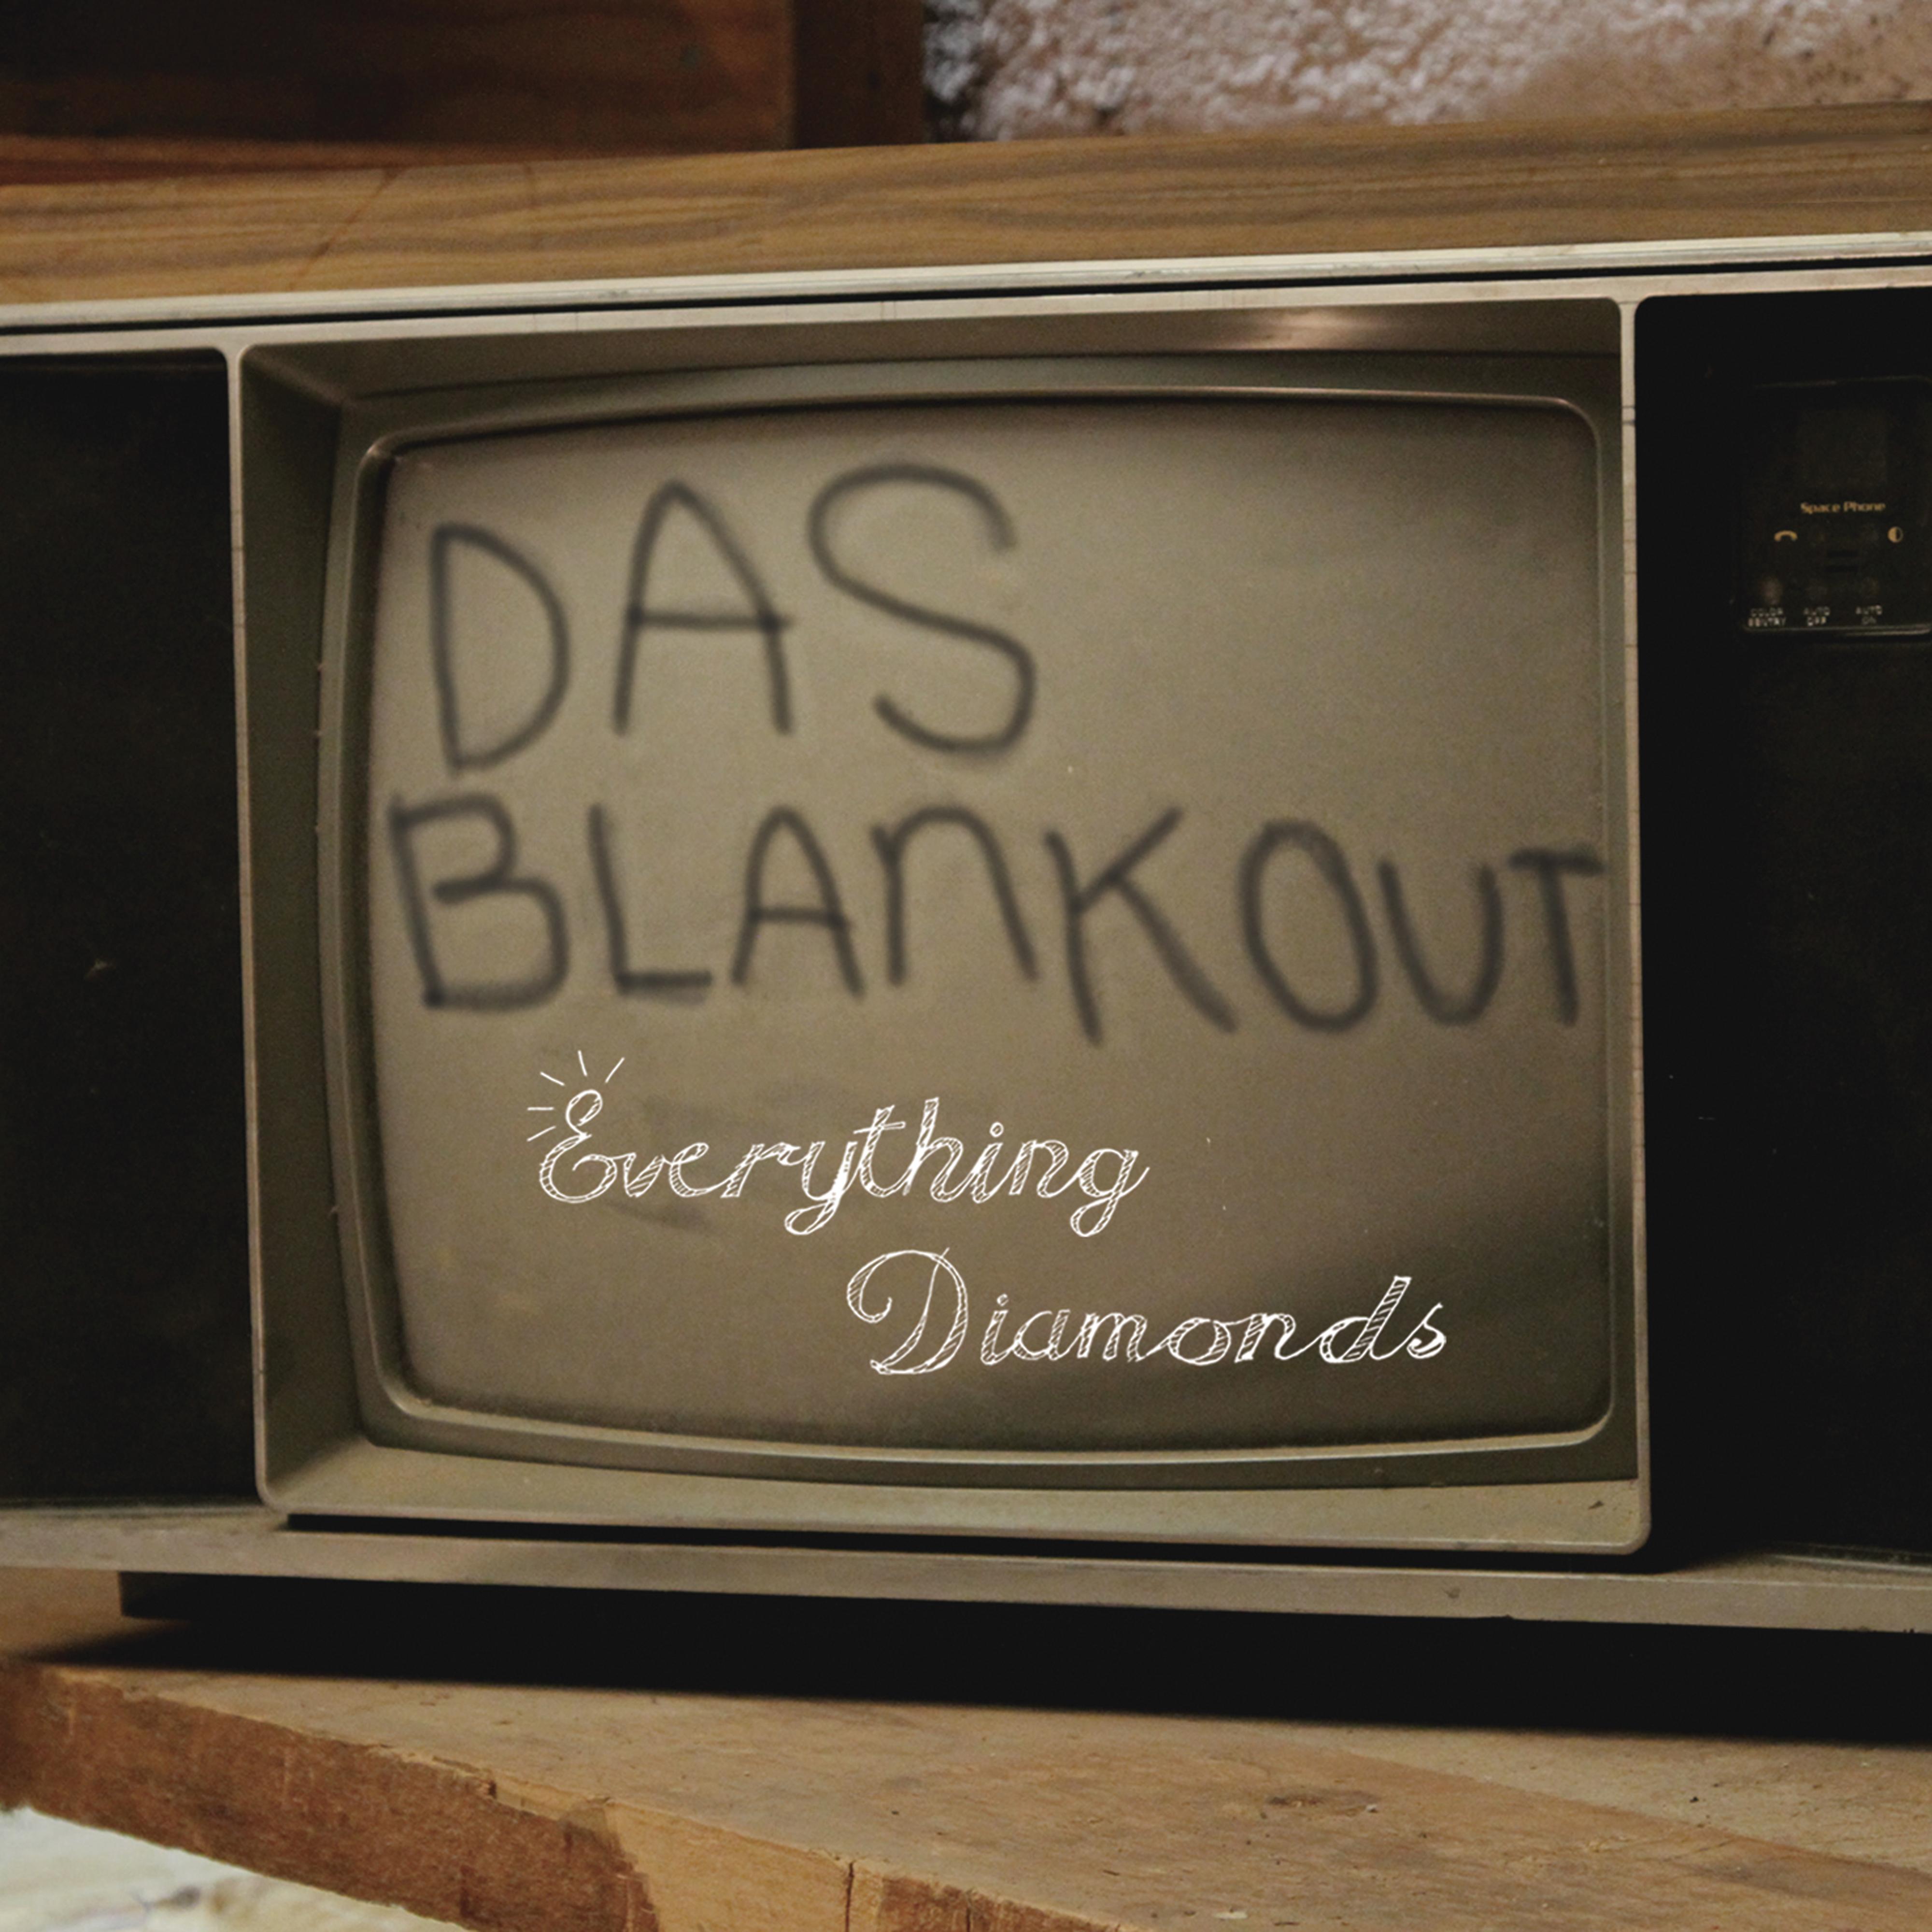 Das Blankout - Everything Diamonds